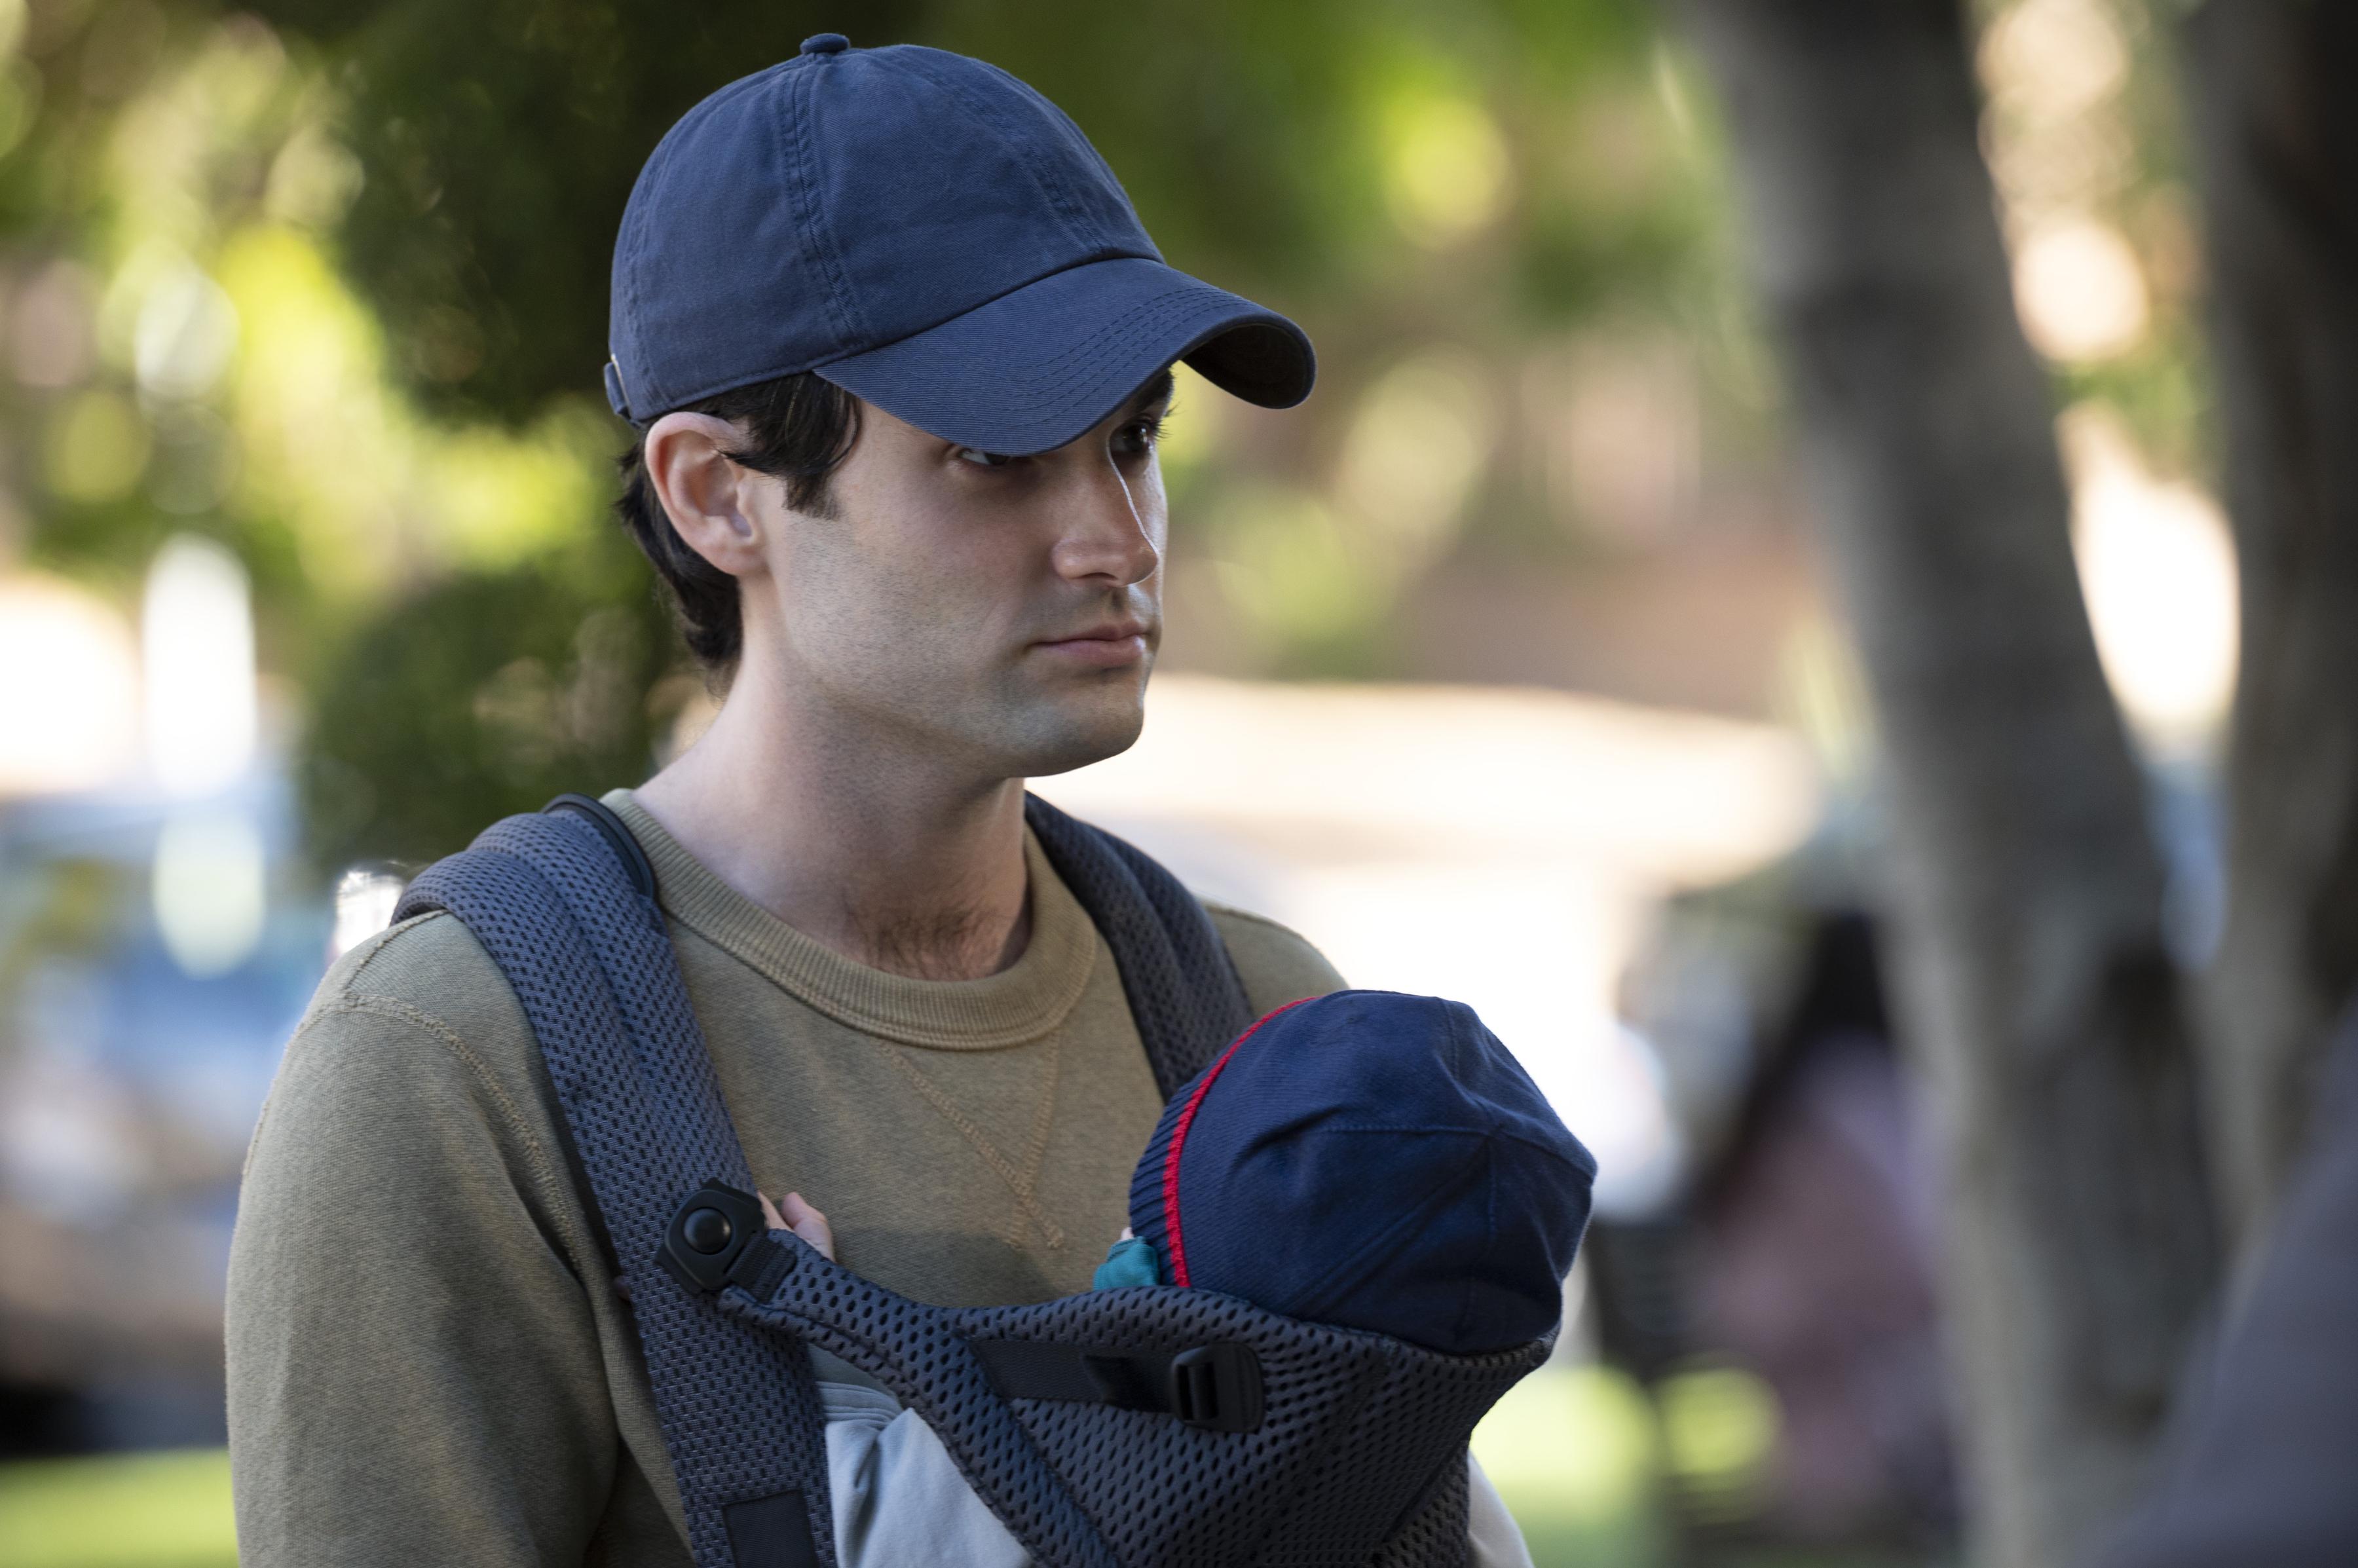 You Season 3 Teaser Has First Glimpse Of Penn Badgley As Suburban Stalker Dad